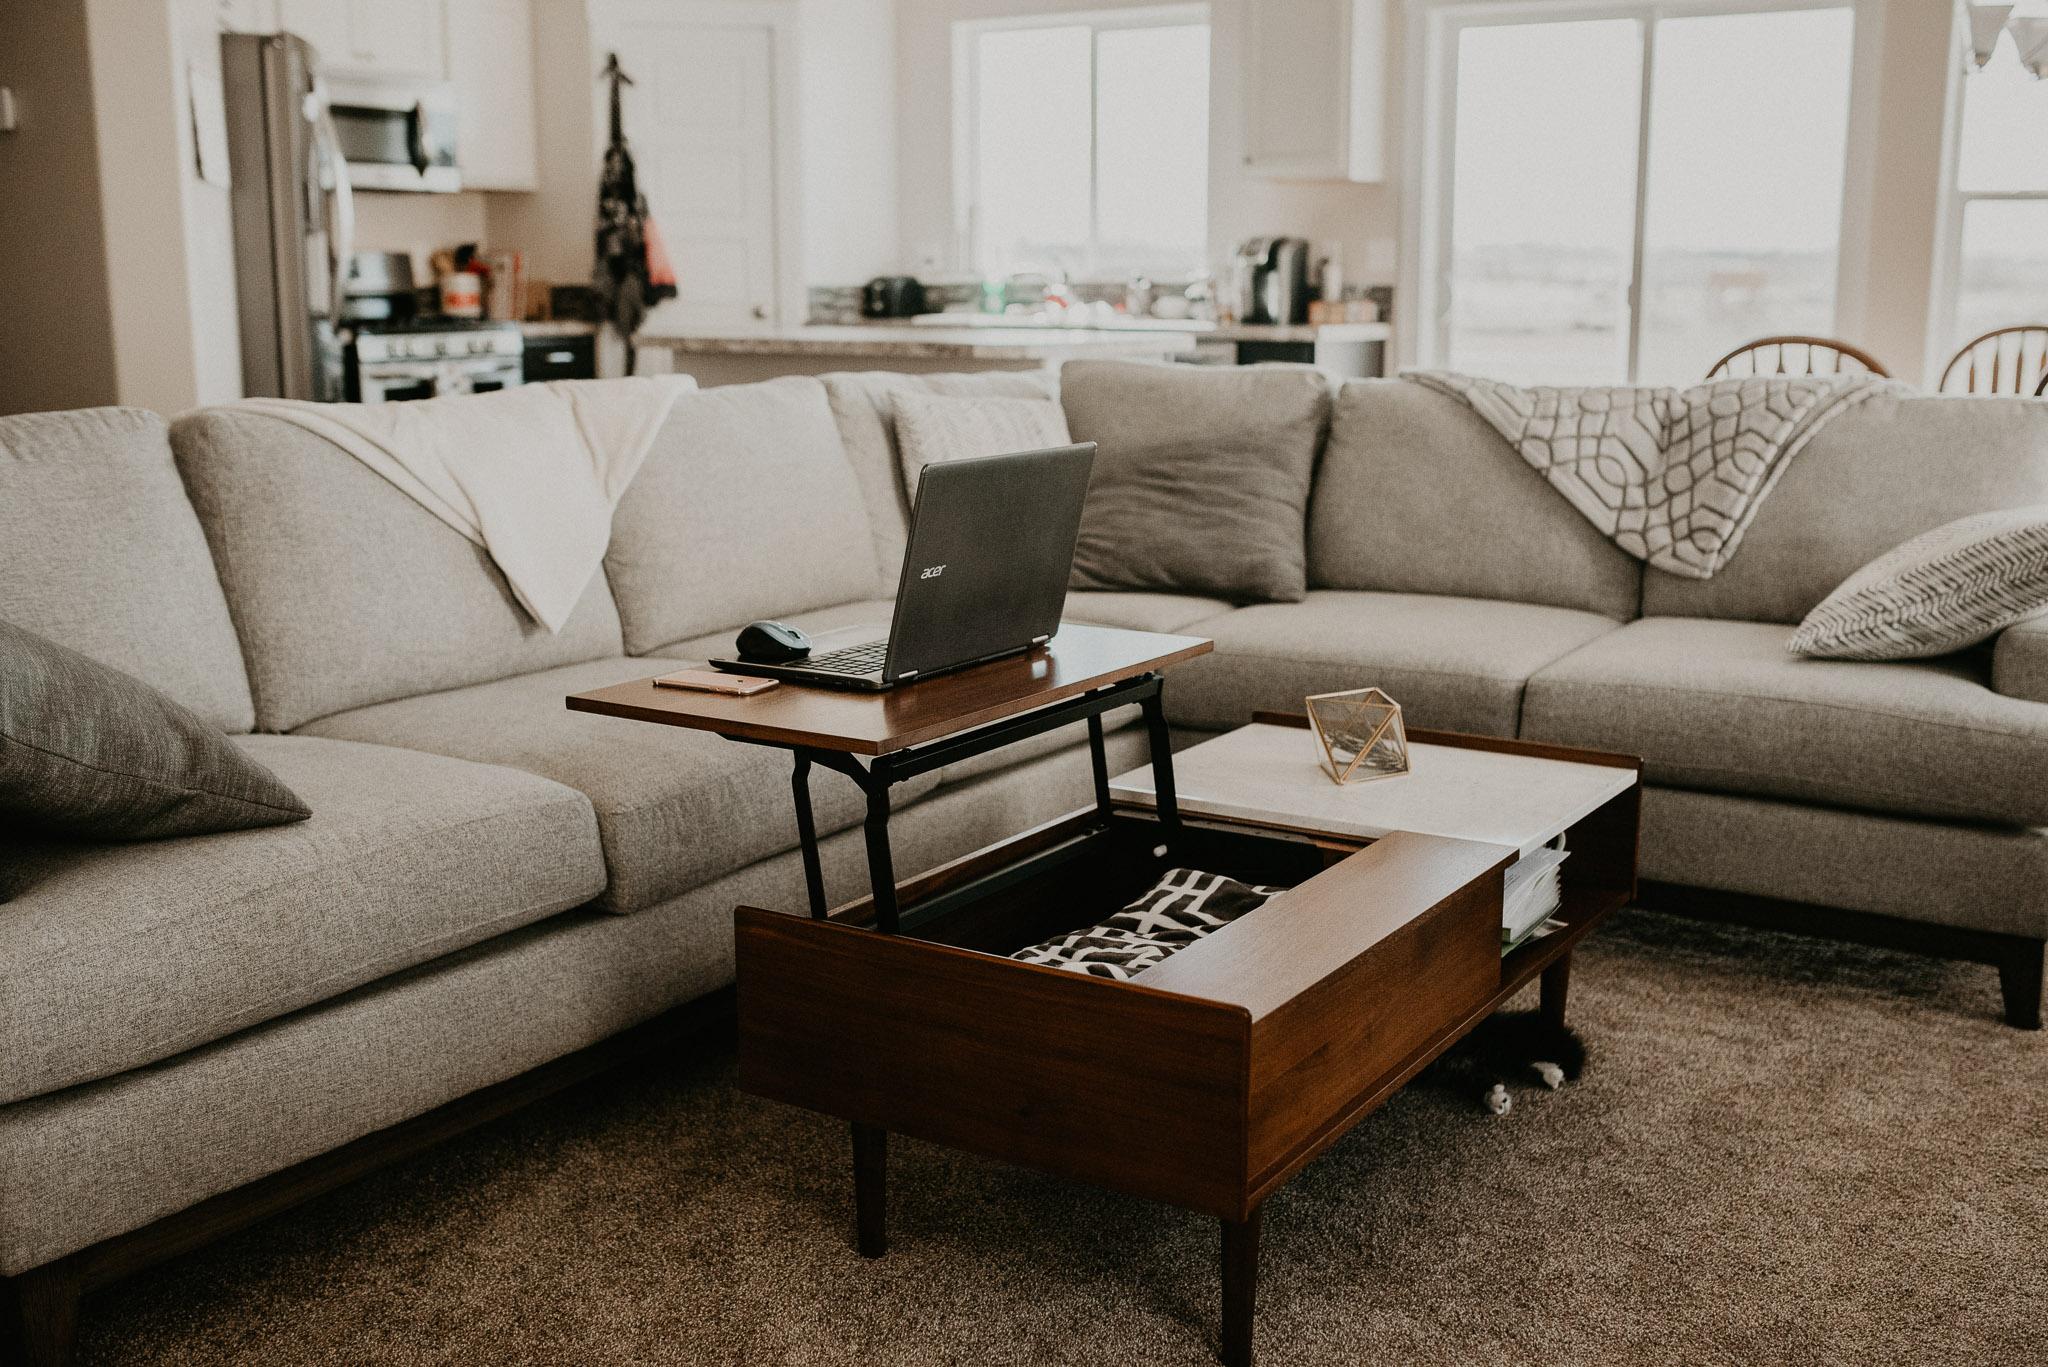 Boise Boudoir Photographer Boise Senior Photographer Makayla Madden Photography Mid Century Modern Living Room Decor Ideas Target West Elm Coffee Table